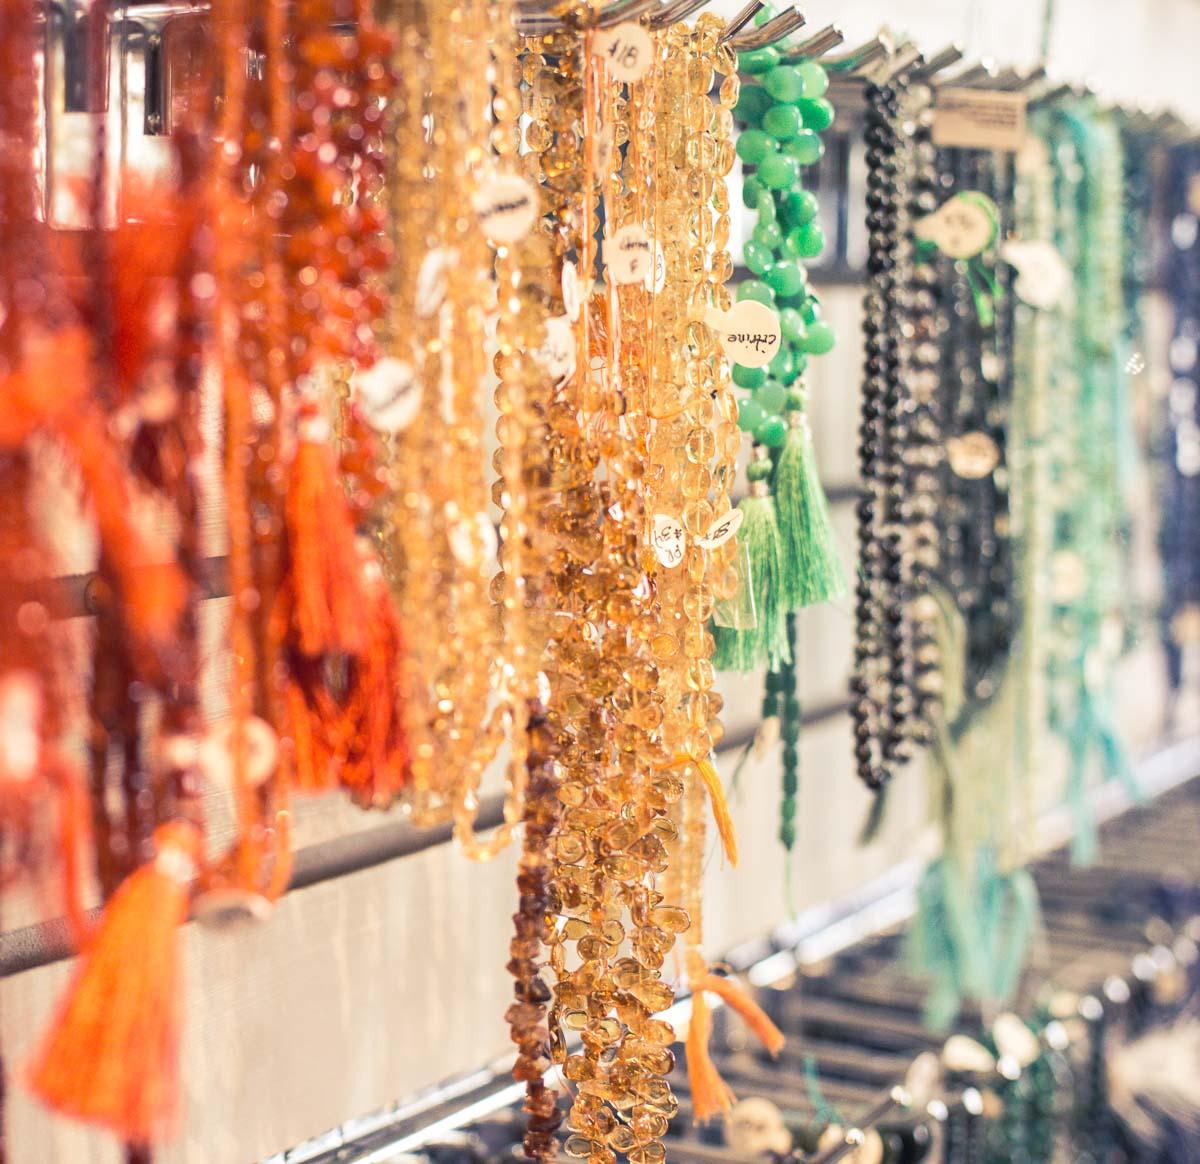 Sparkling Creations Gems precious stones rocks jewlery jewery making beads earrings necklaces custom  -70.jpg